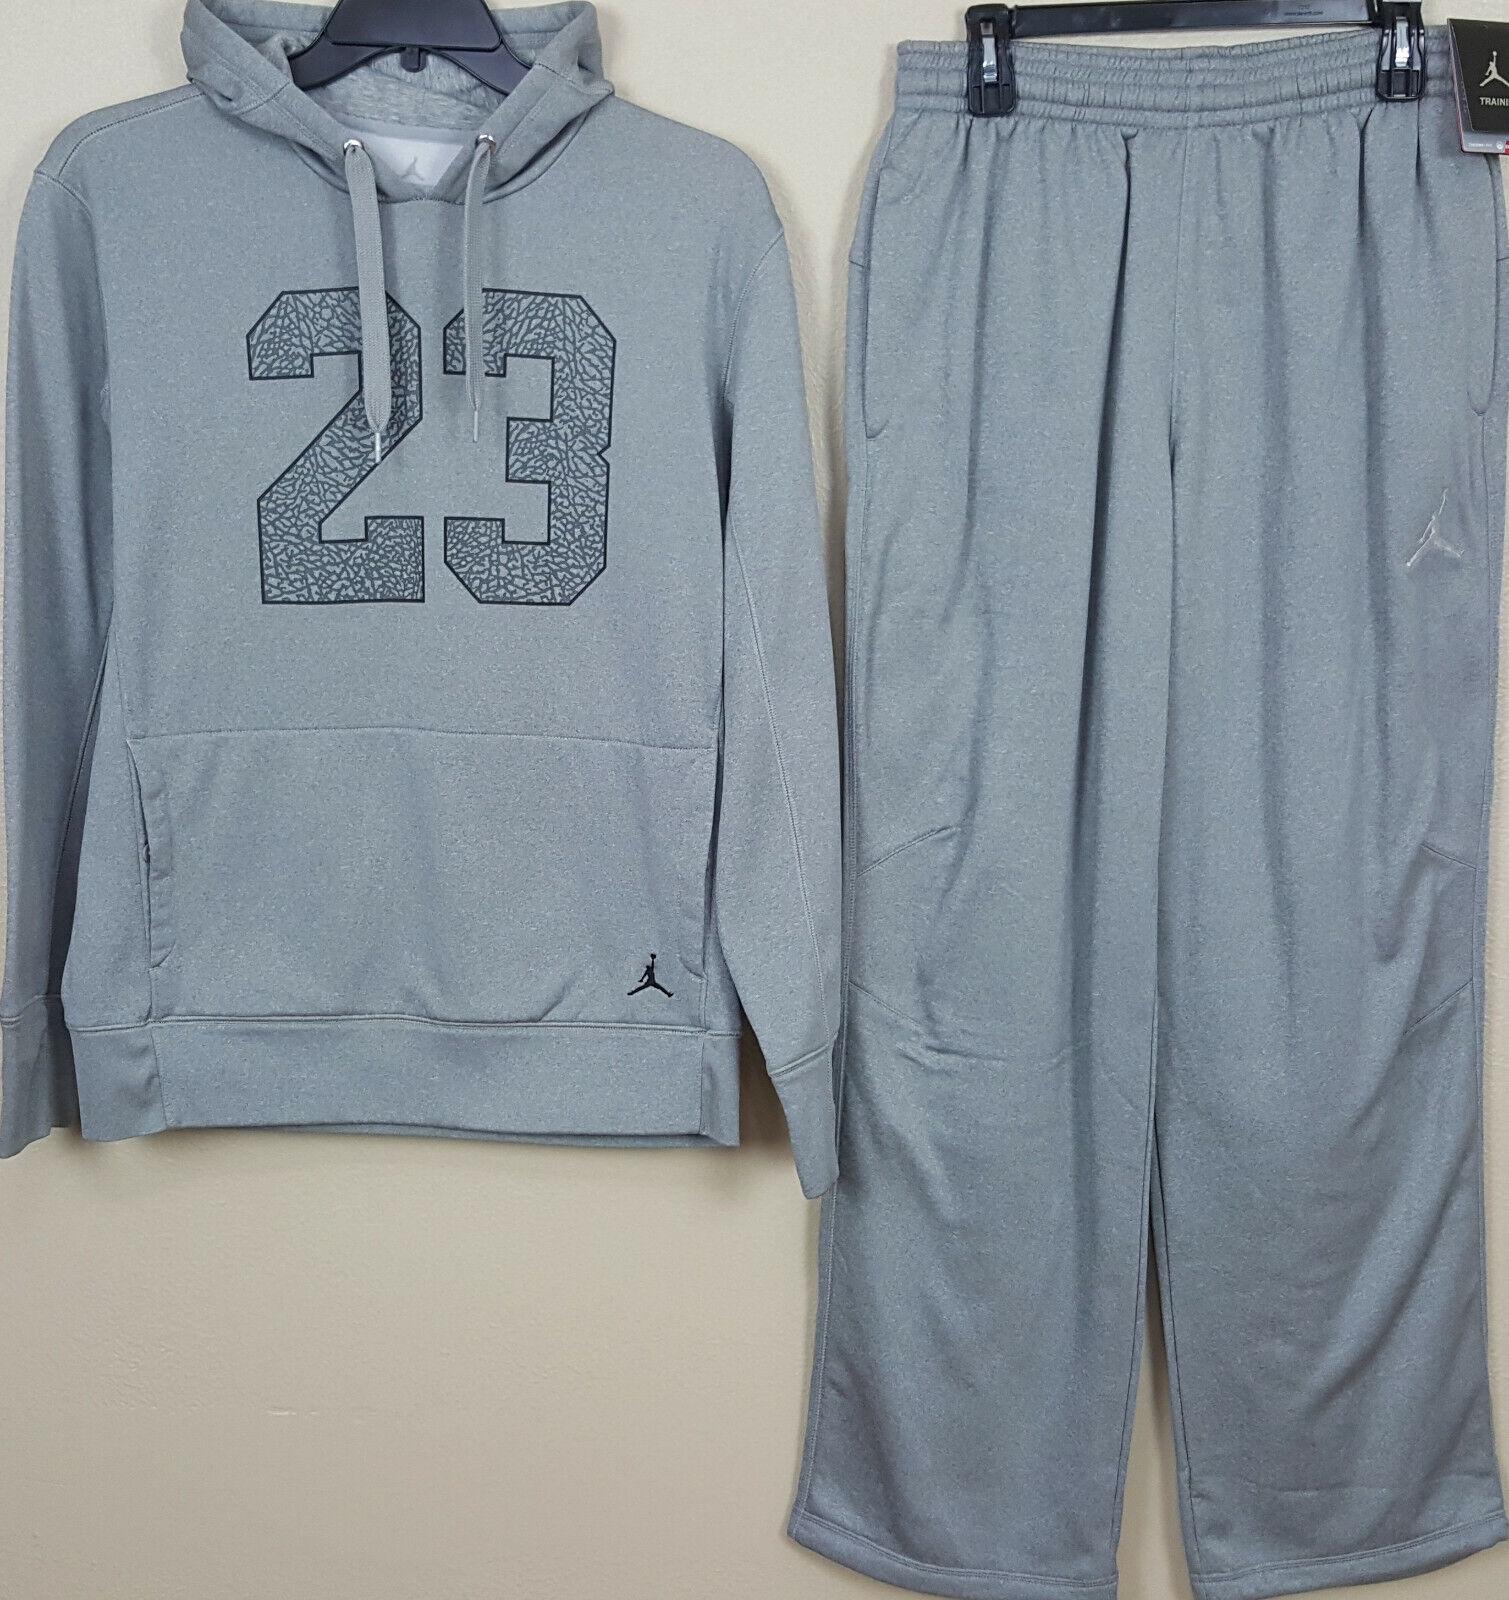 Nike Air Jordan V P51 Camo Sweatsuit